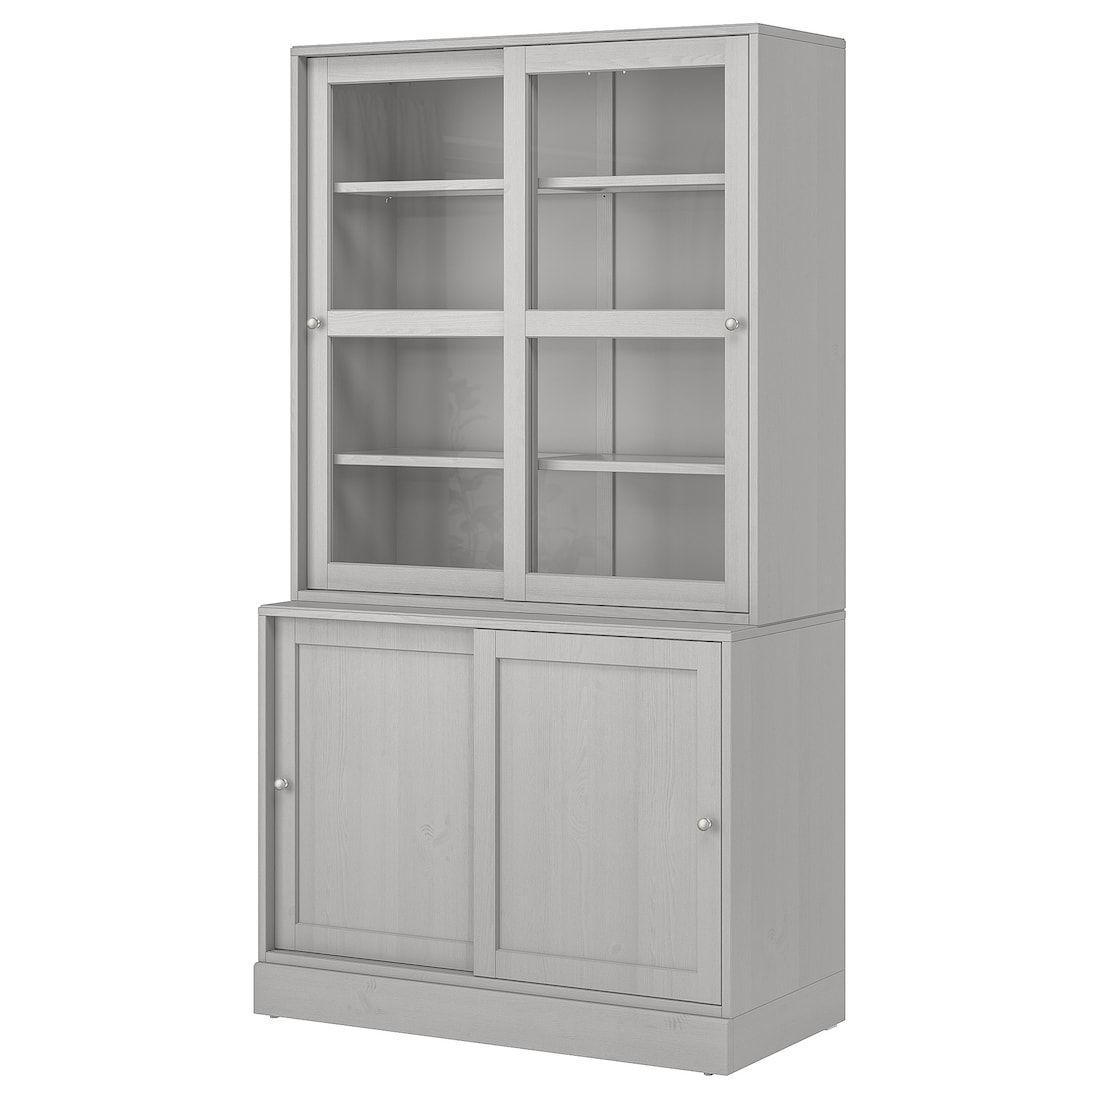 Ikea Ante Vetro Billy.Havsta Combinaz Ante A Vetro Scorrevoli Grigio 121x47x212 Cm In